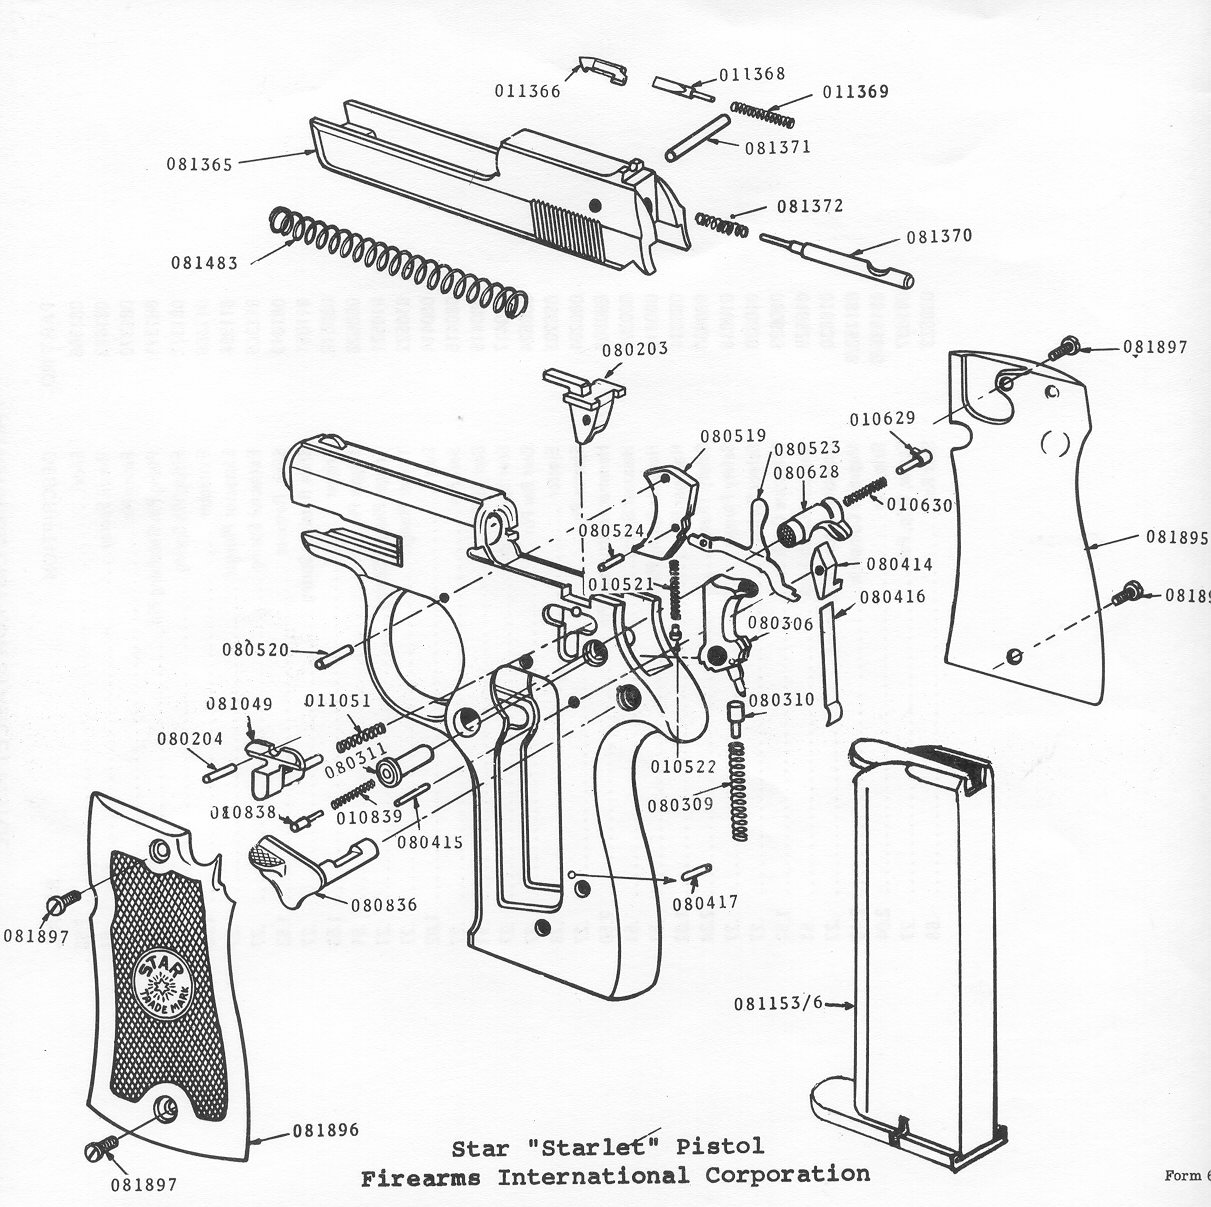 Phoenix Arms 25mm Handgun Parts